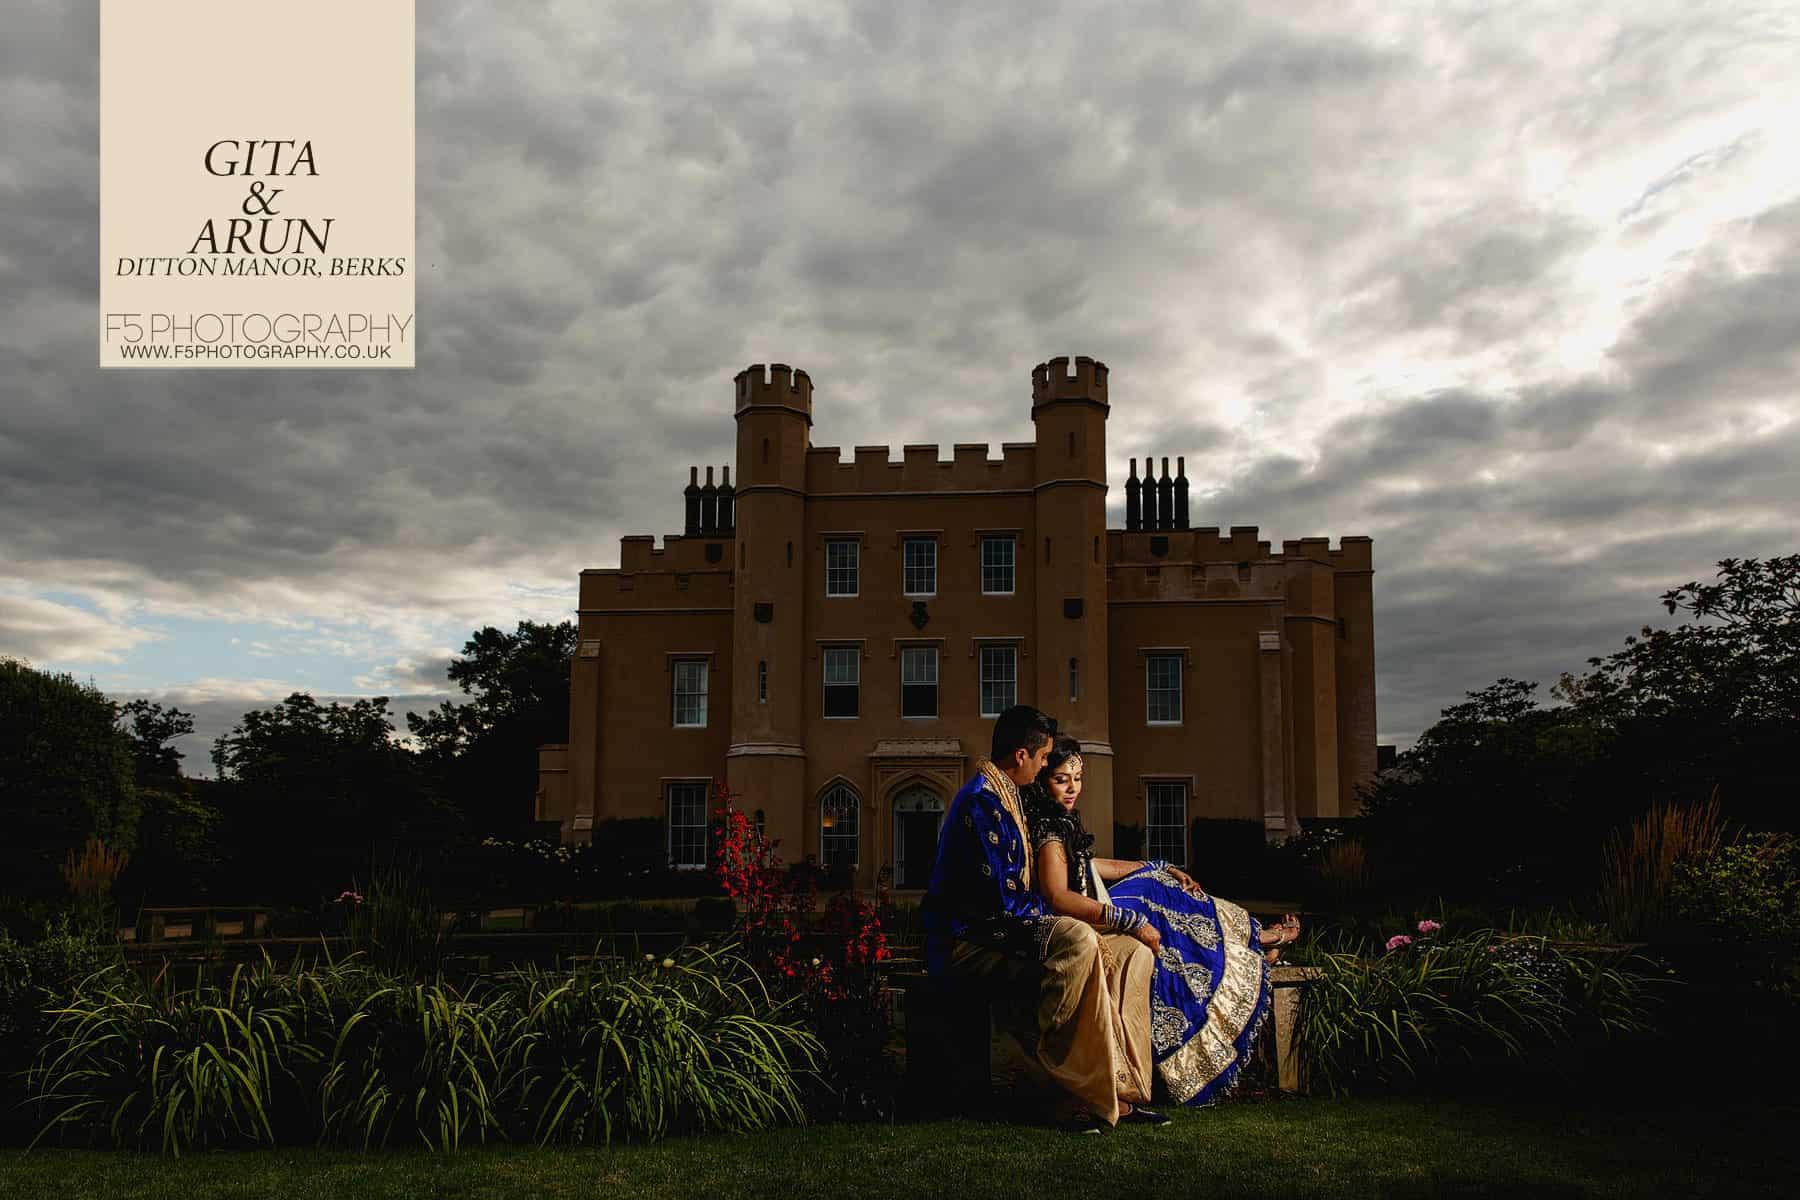 ditton manor asian wedding